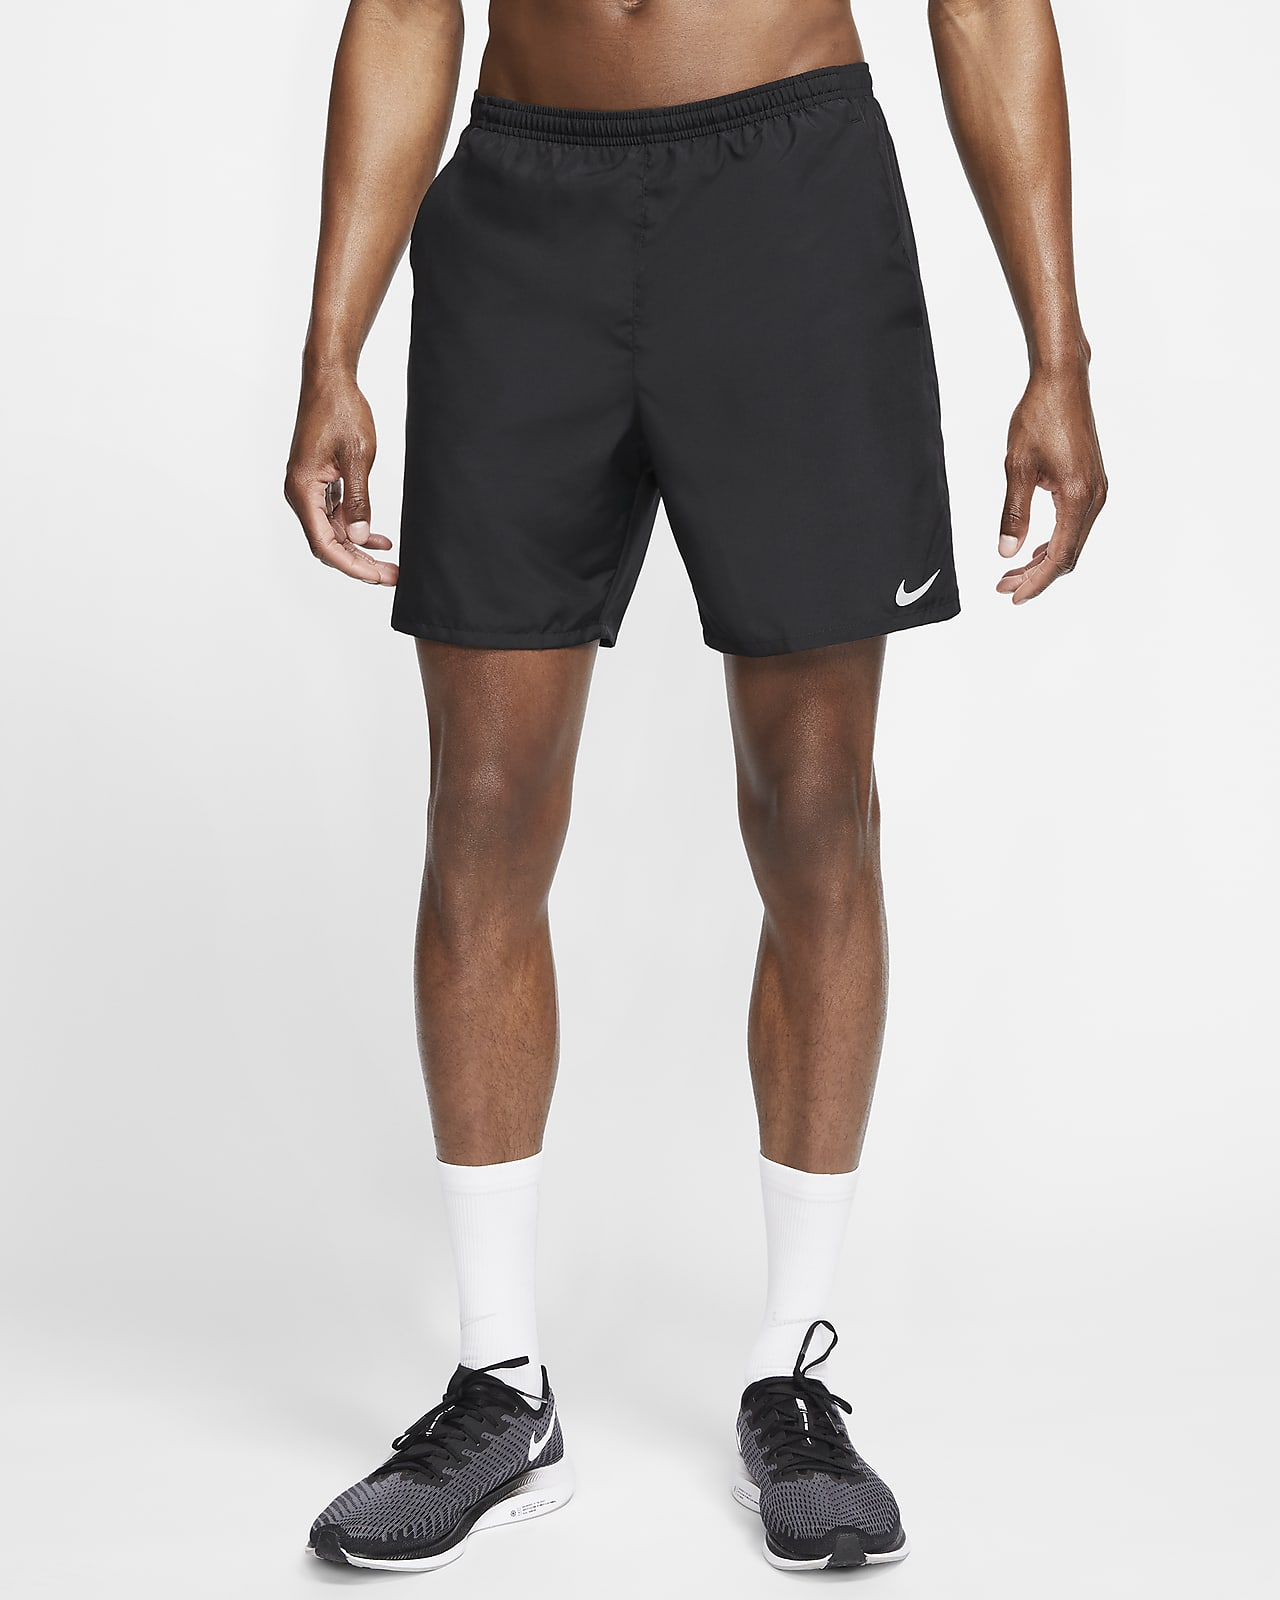 Nike Dri-FIT Run Men's 18cm (approx.) Running Shorts